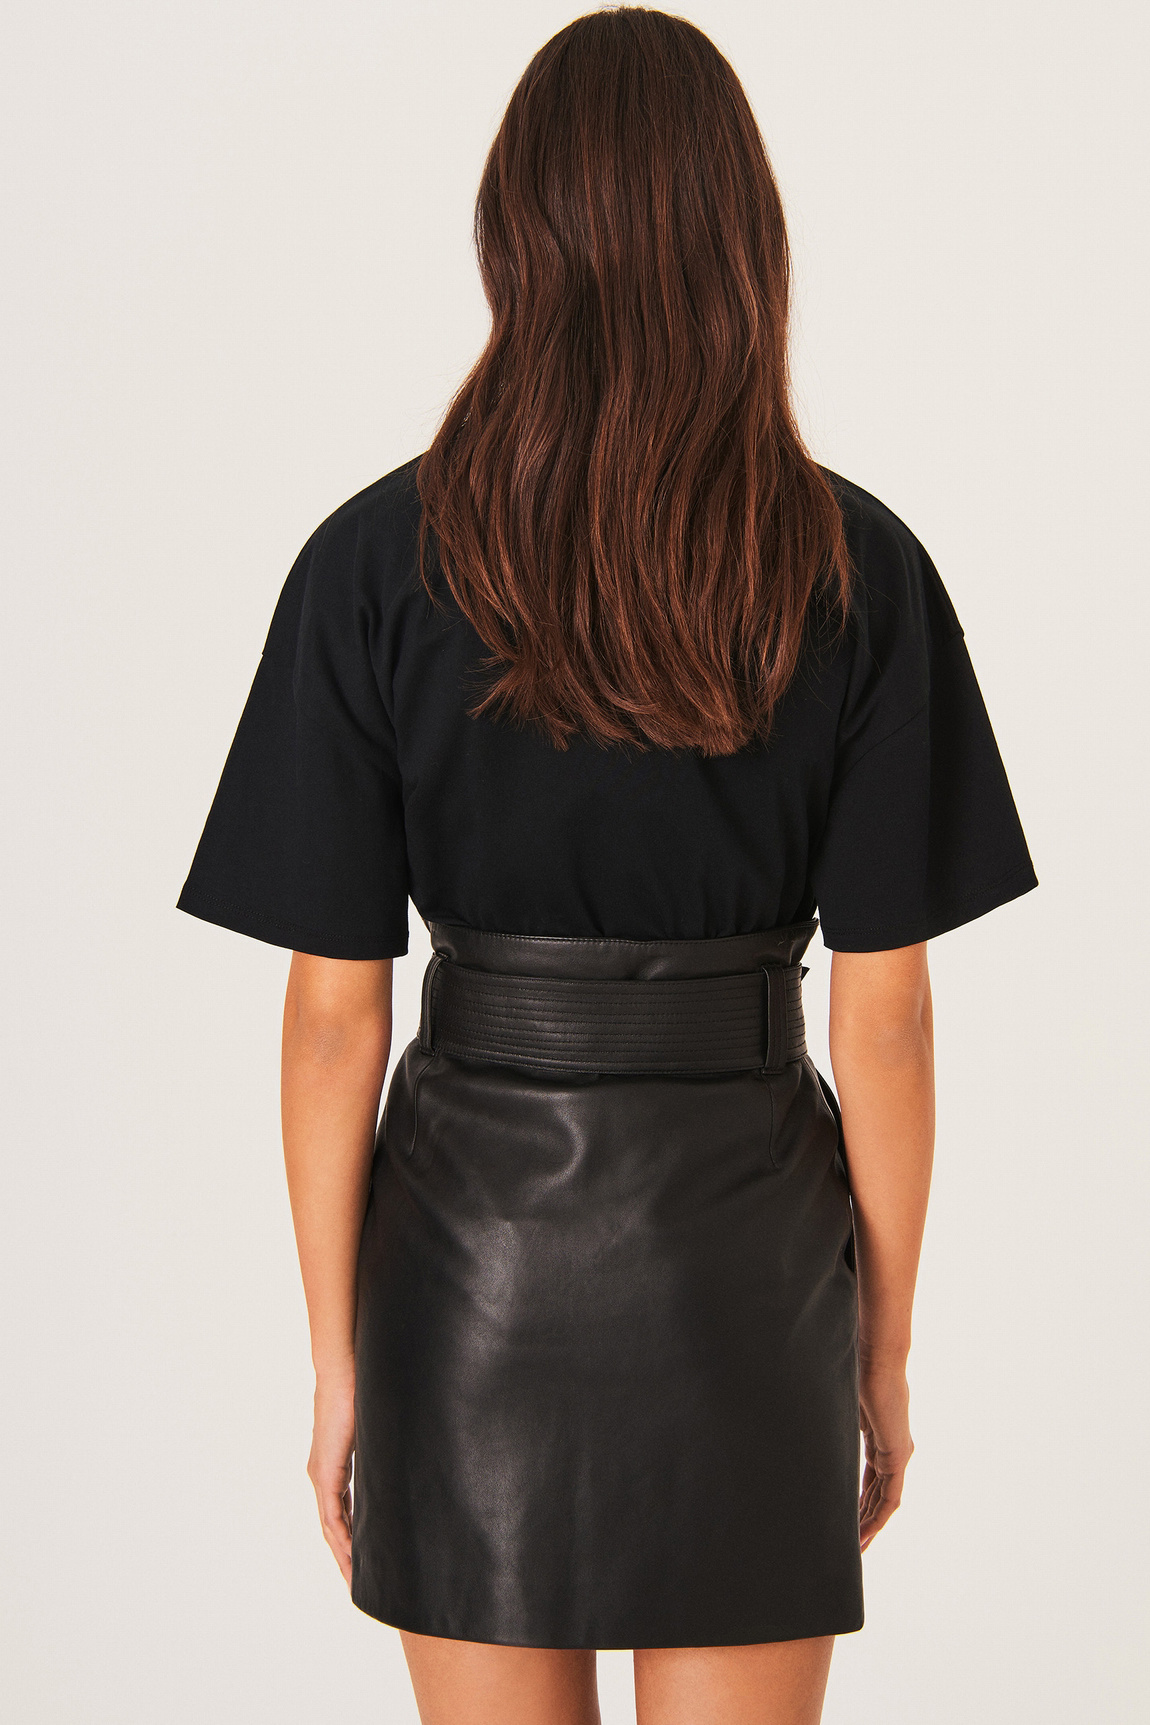 Amor T-Shirt - Black-7